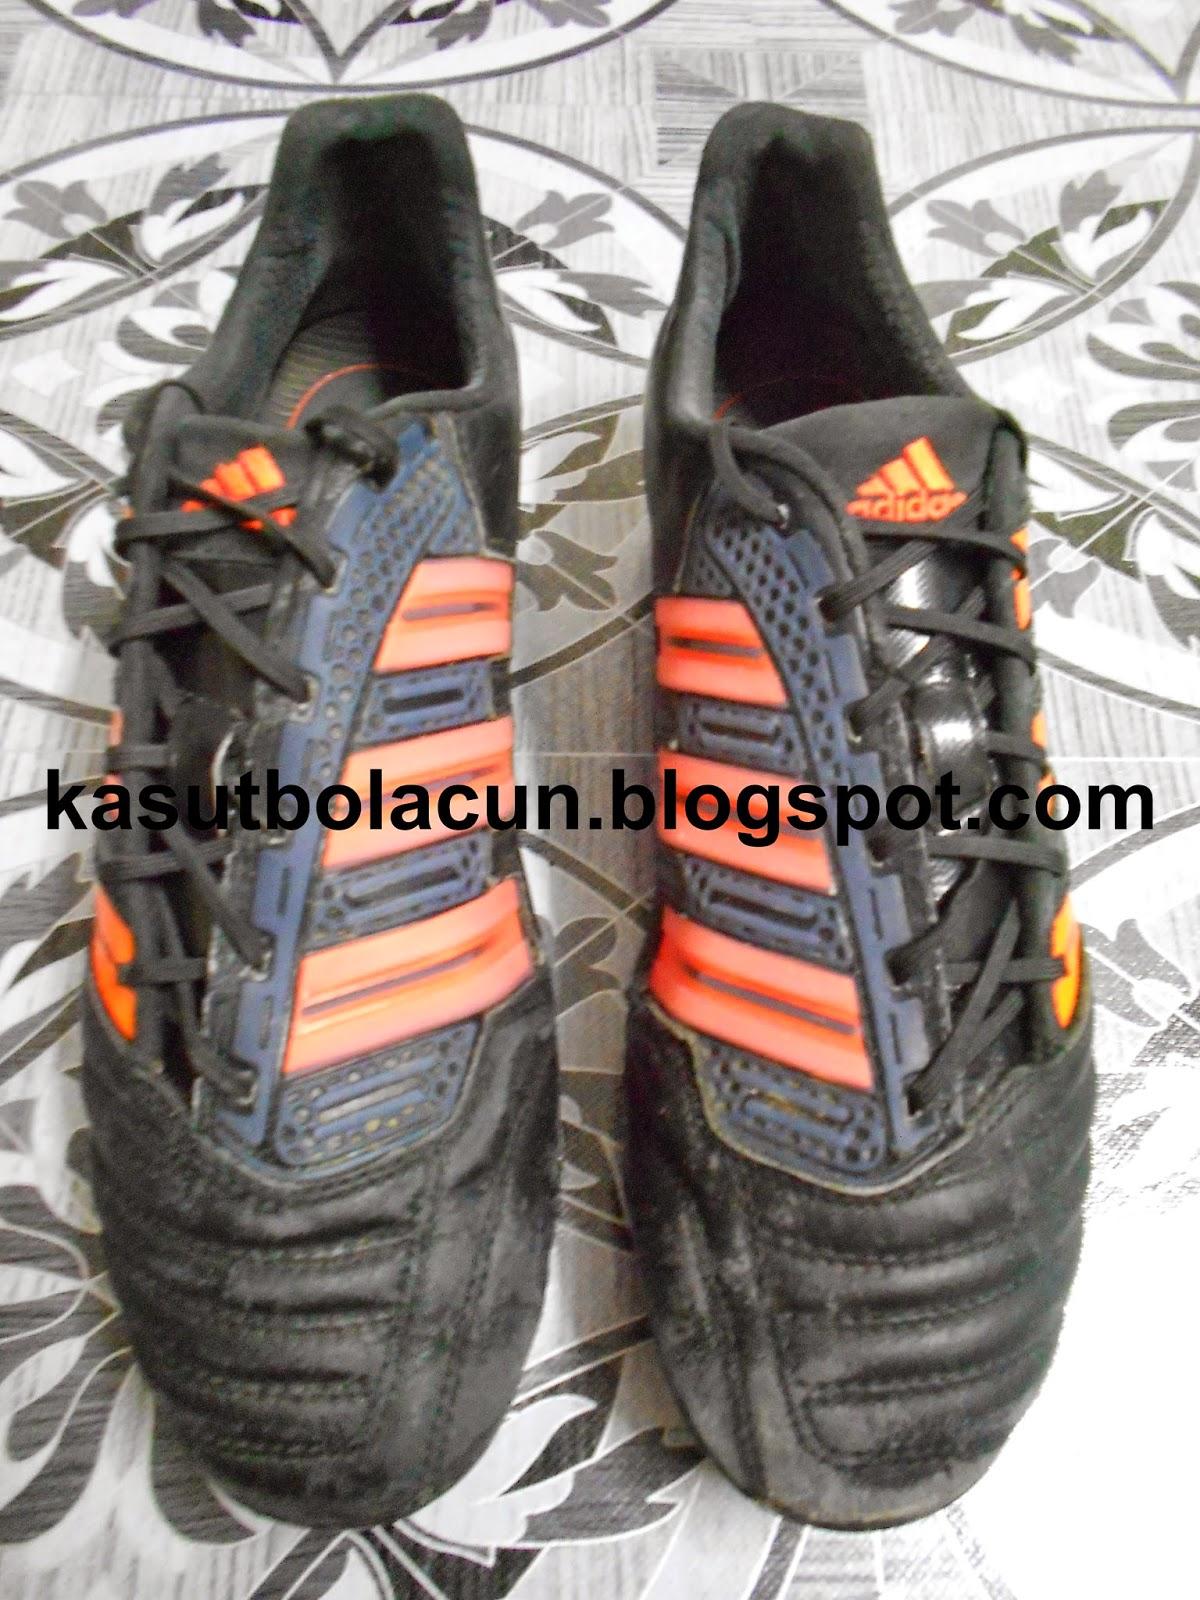 http://kasutbolacun.blogspot.com/2014/11/adidas-adipower-predator-fg_22.html